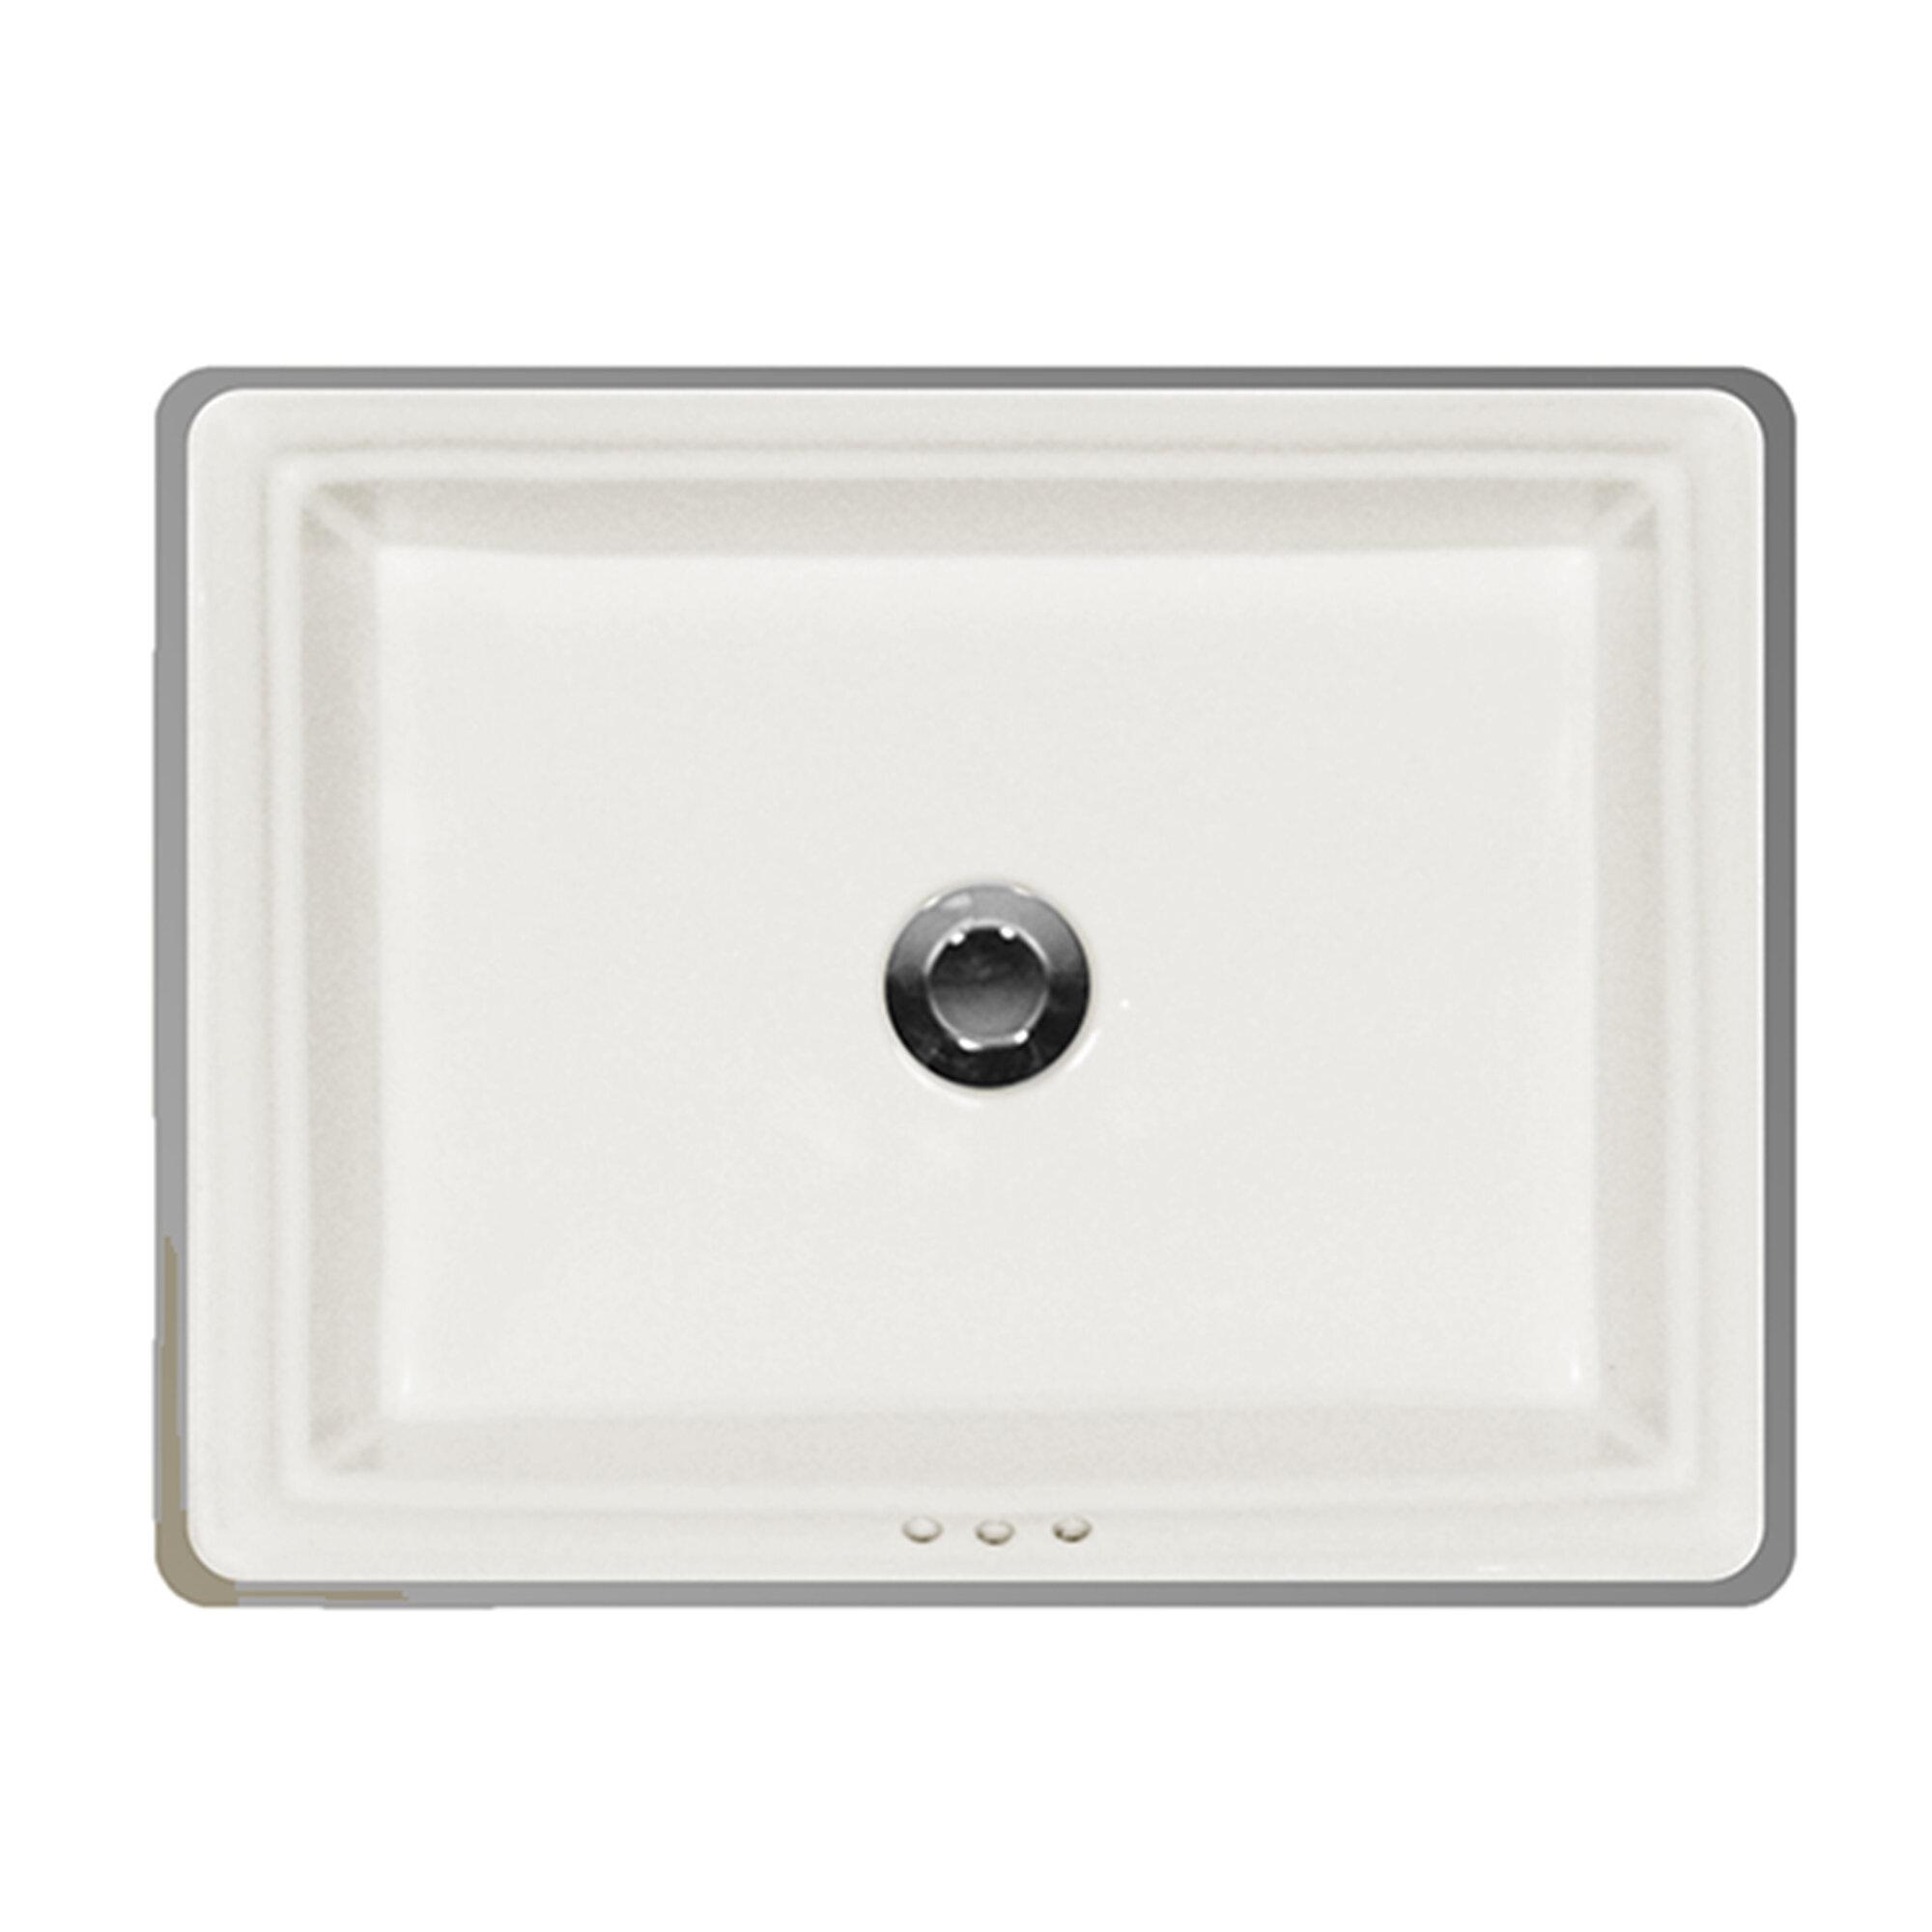 St Thomas Creations By Icera Presley Vitreous China Rectangular Undermount Bathroom Sink With Overflow Wayfair